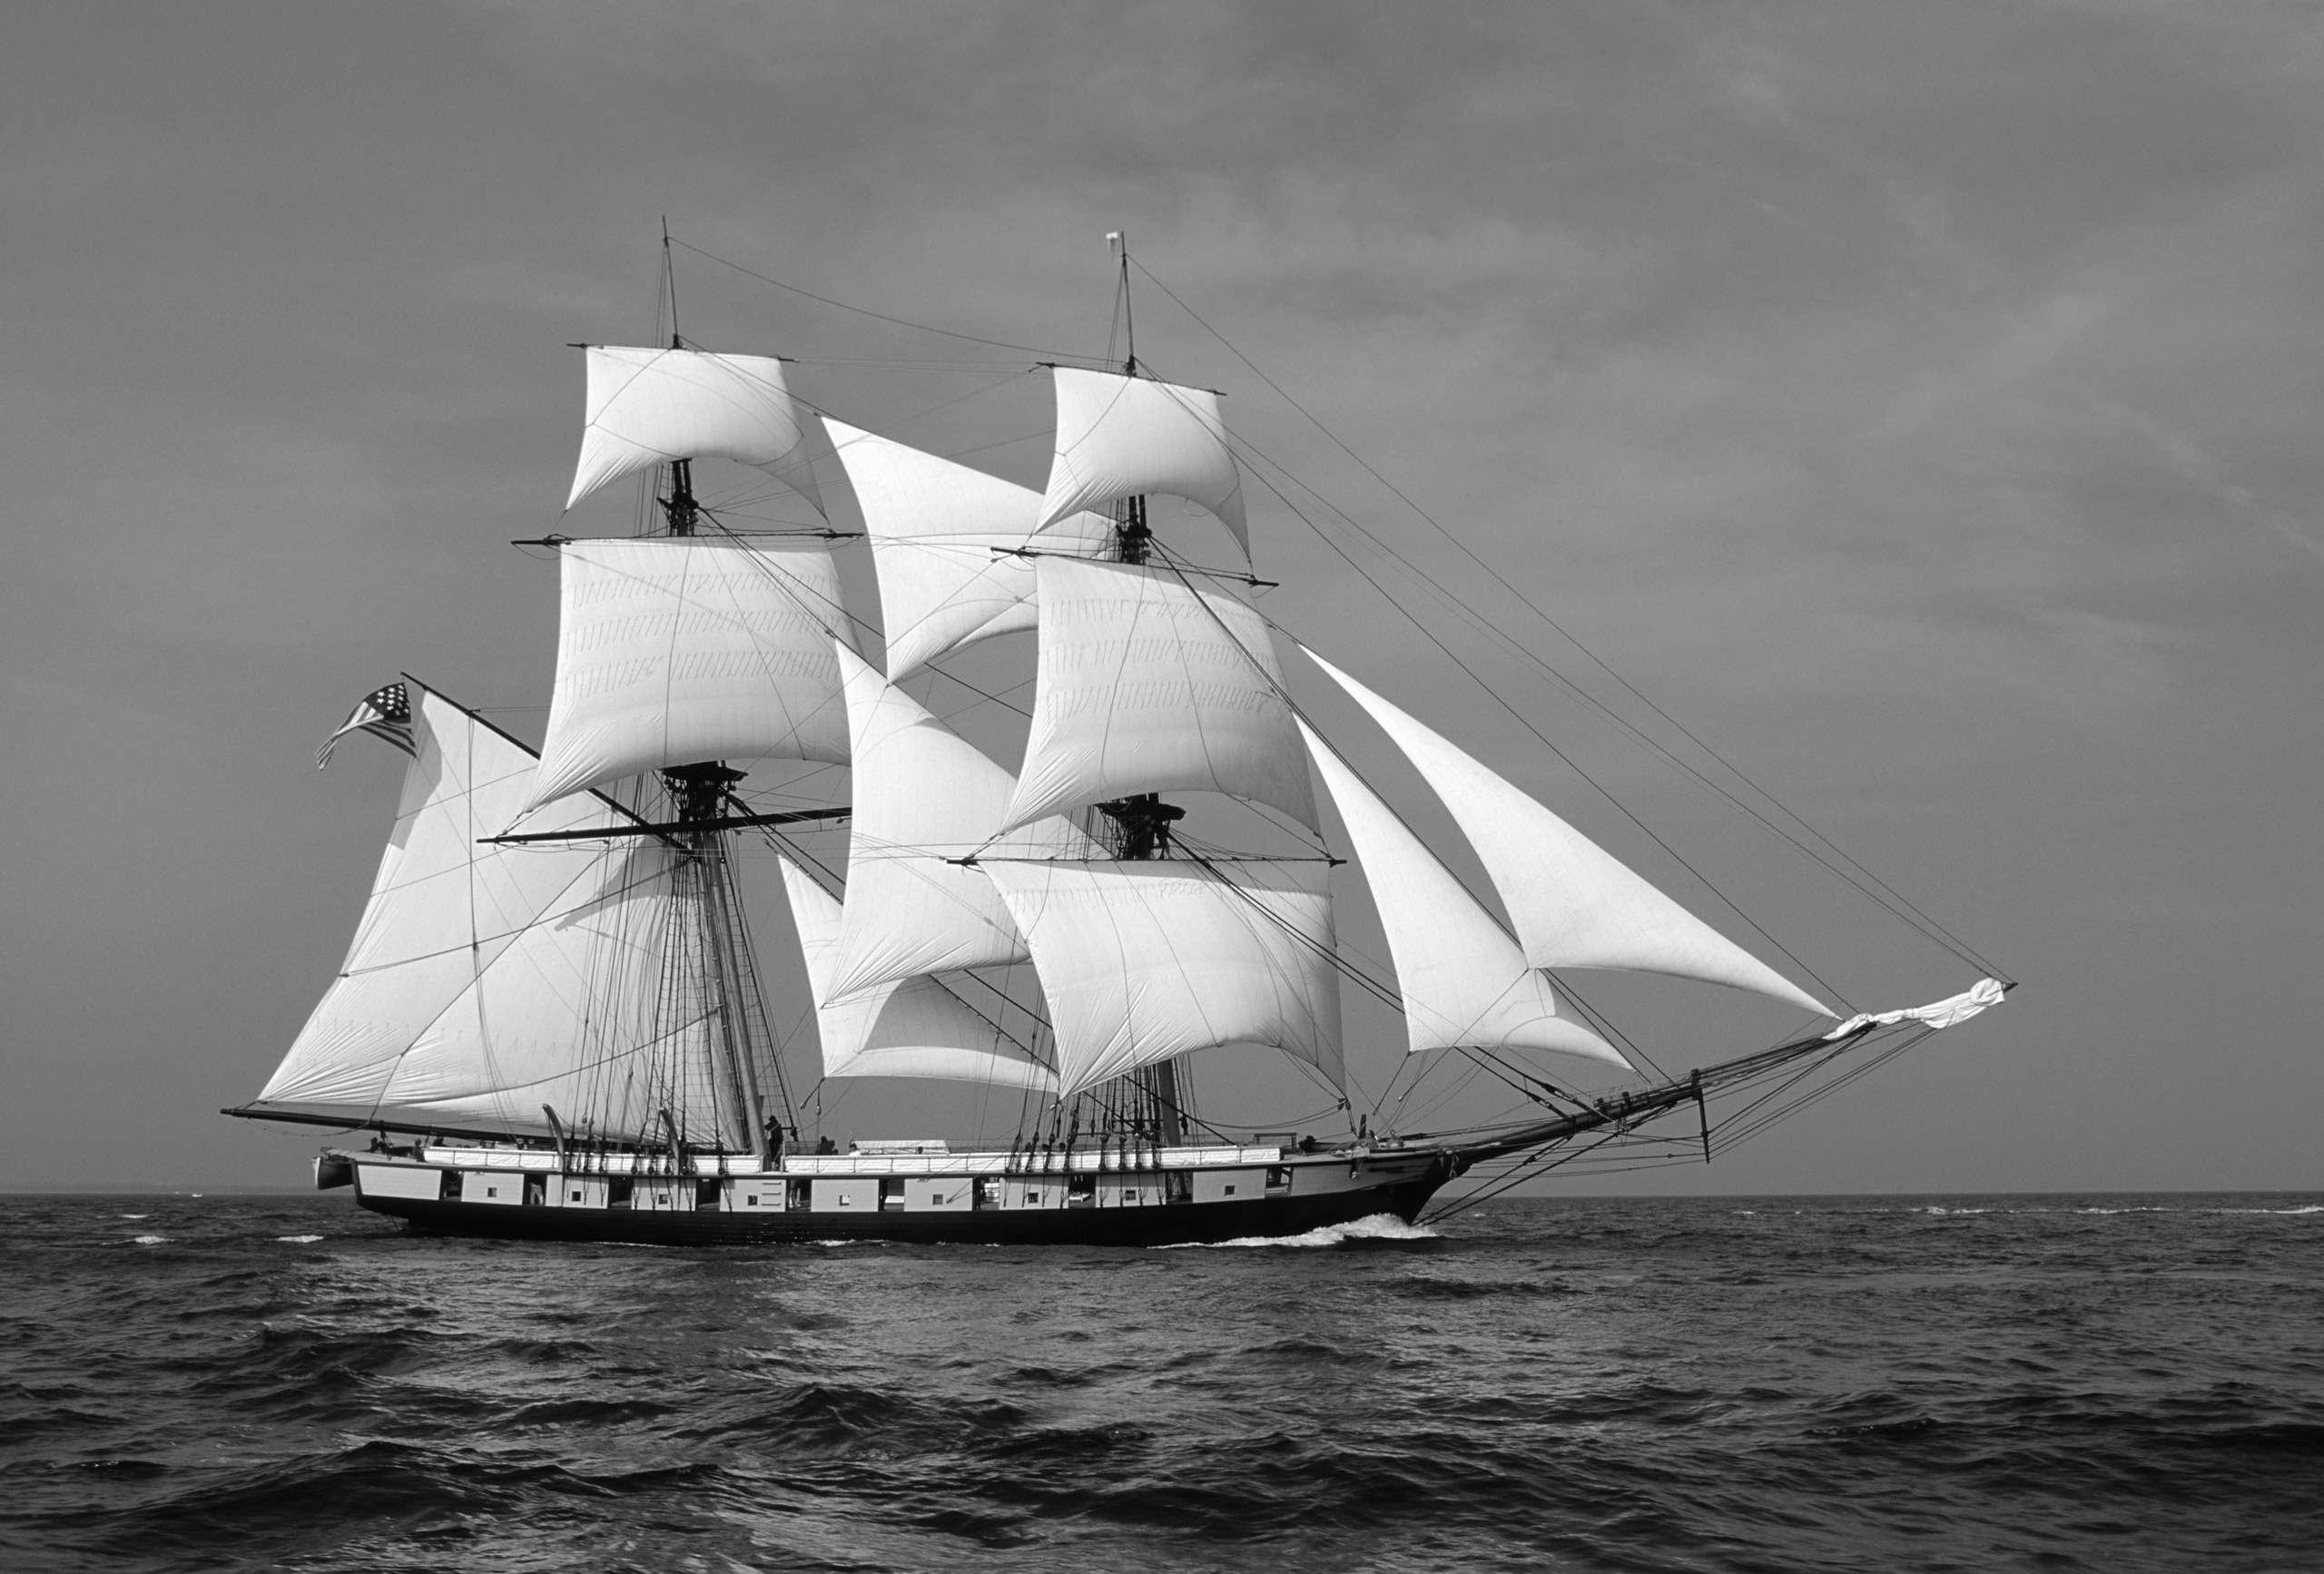 PORTFOLIO - Sailing - Tall Ships #23-PCG257